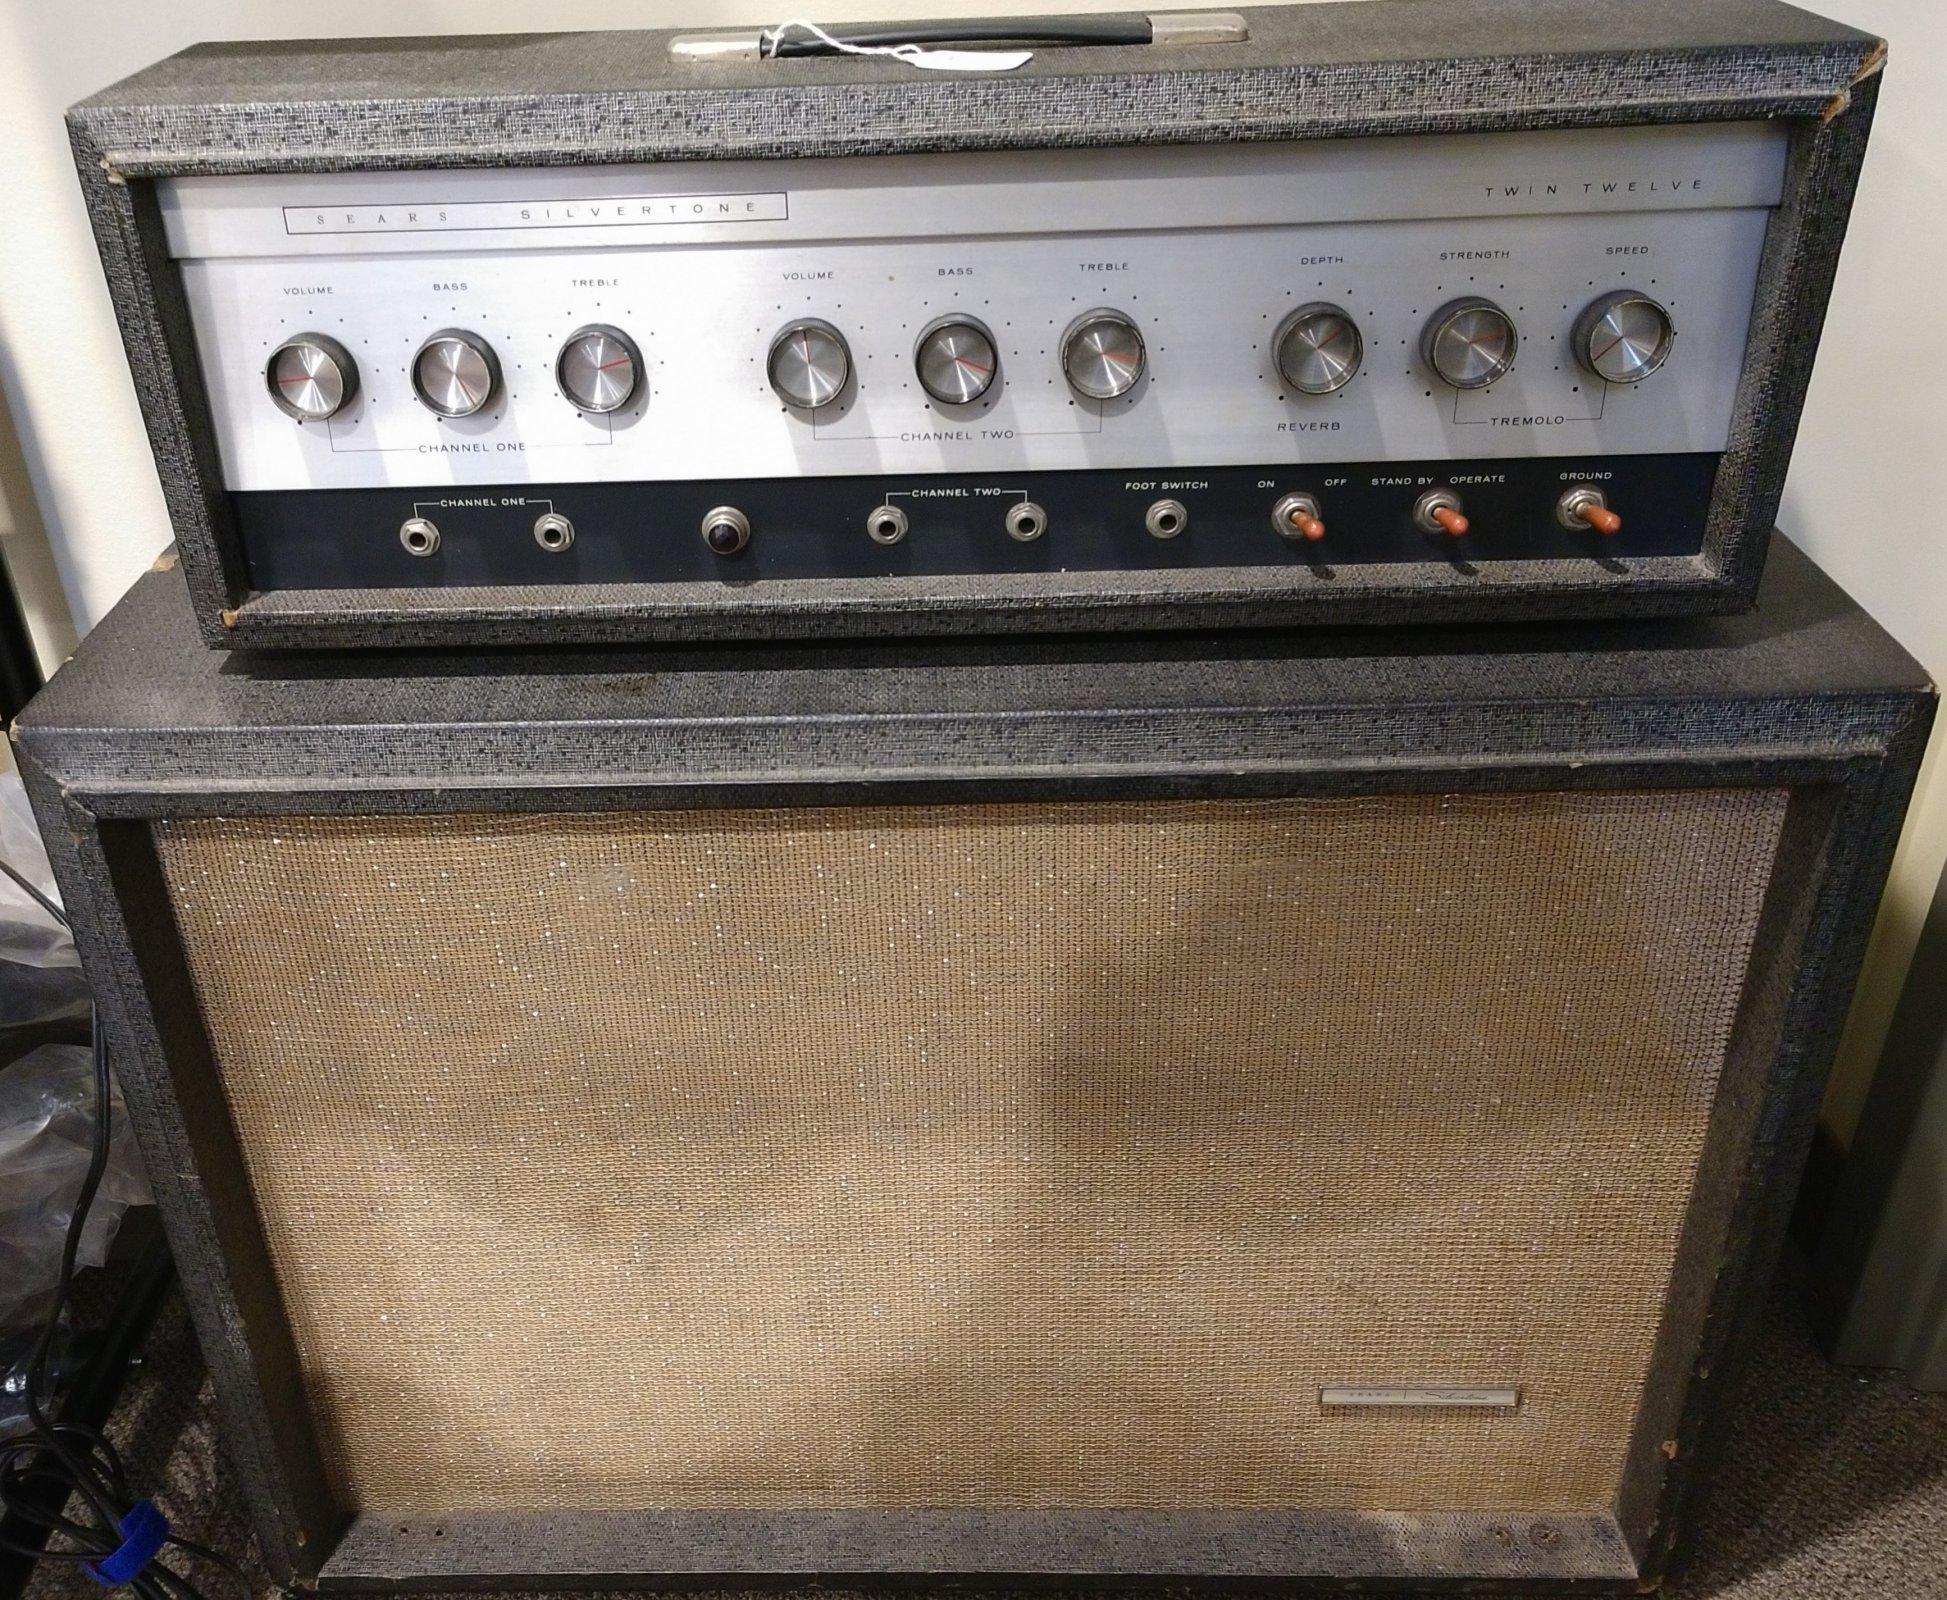 AMPLIFIER - 60s era Silvertone 1484 2x12 Tube w/ Cover - 60 Watts